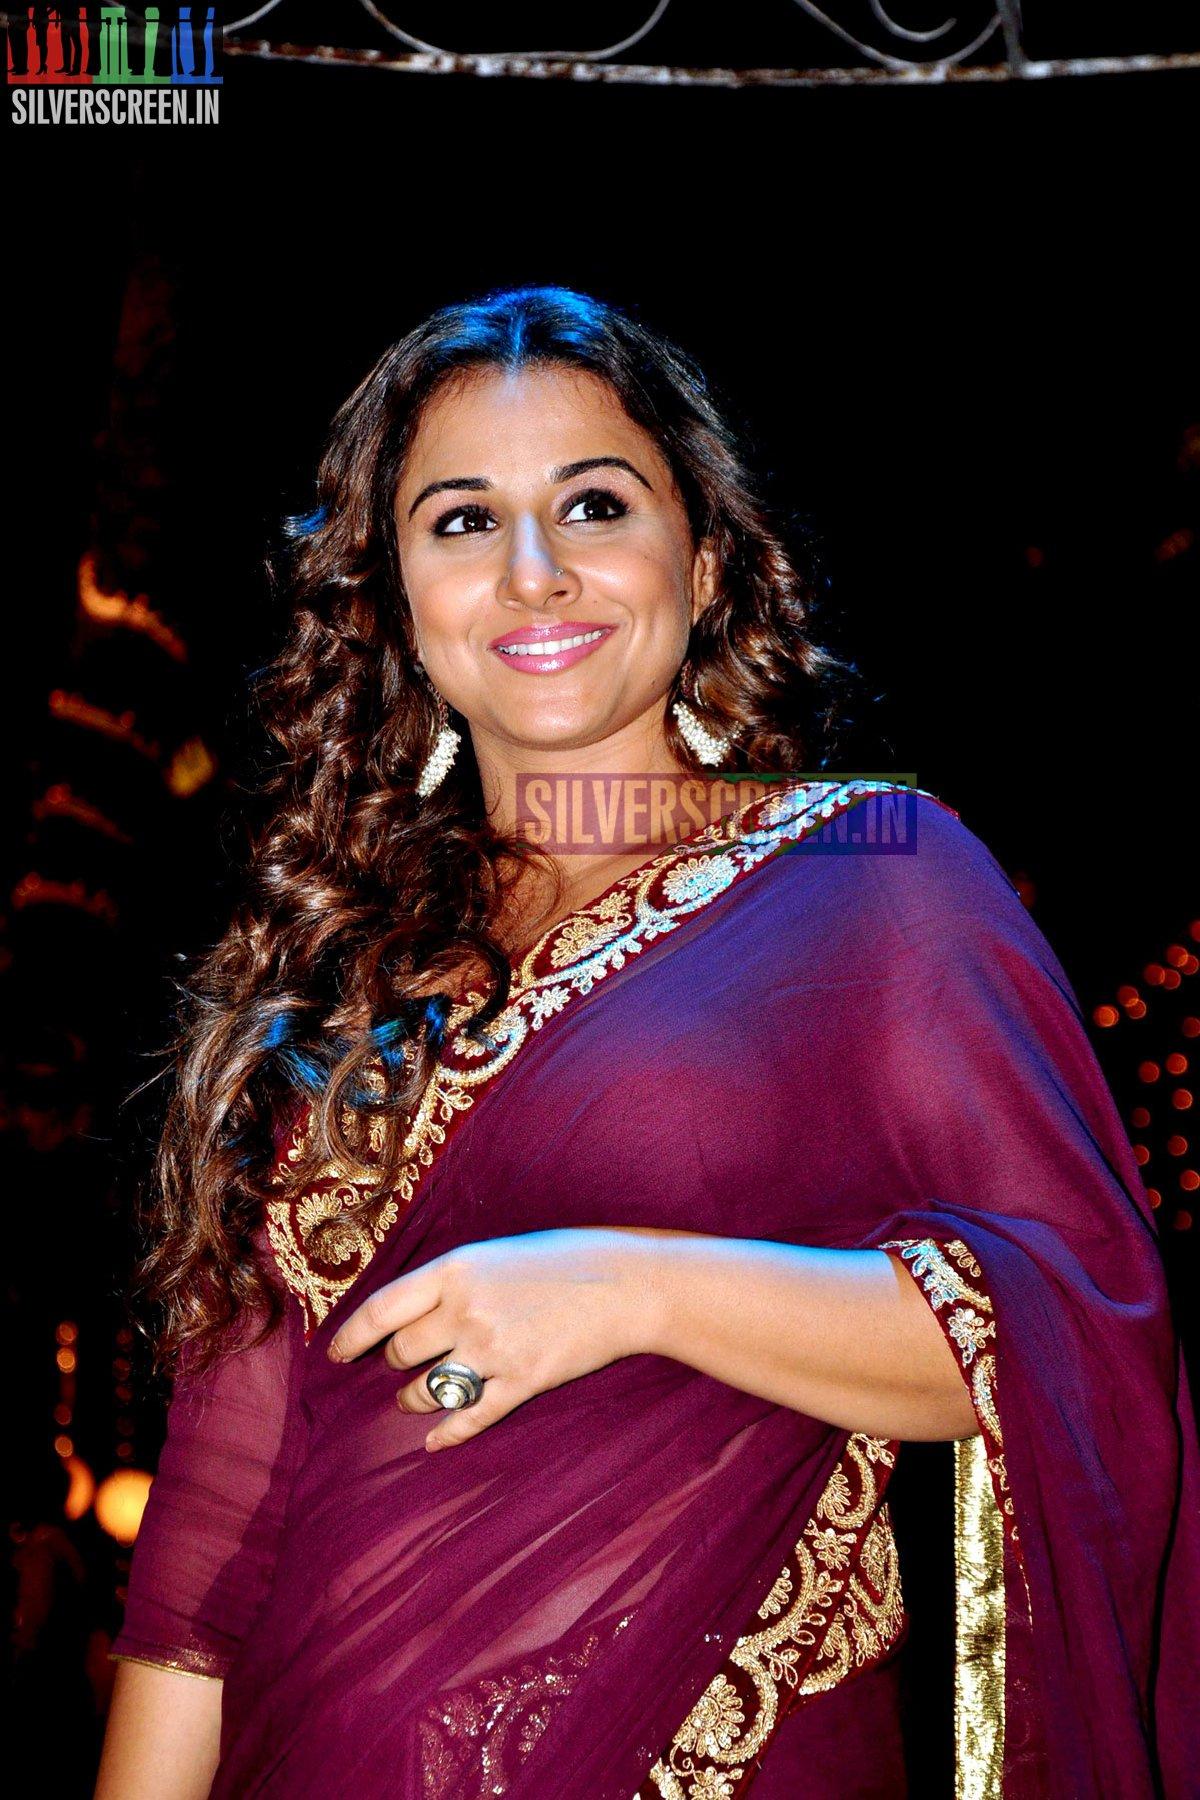 Vidya Balan Promotes Hamari Adhuri Kahani on Colors TV – Silverscreen in